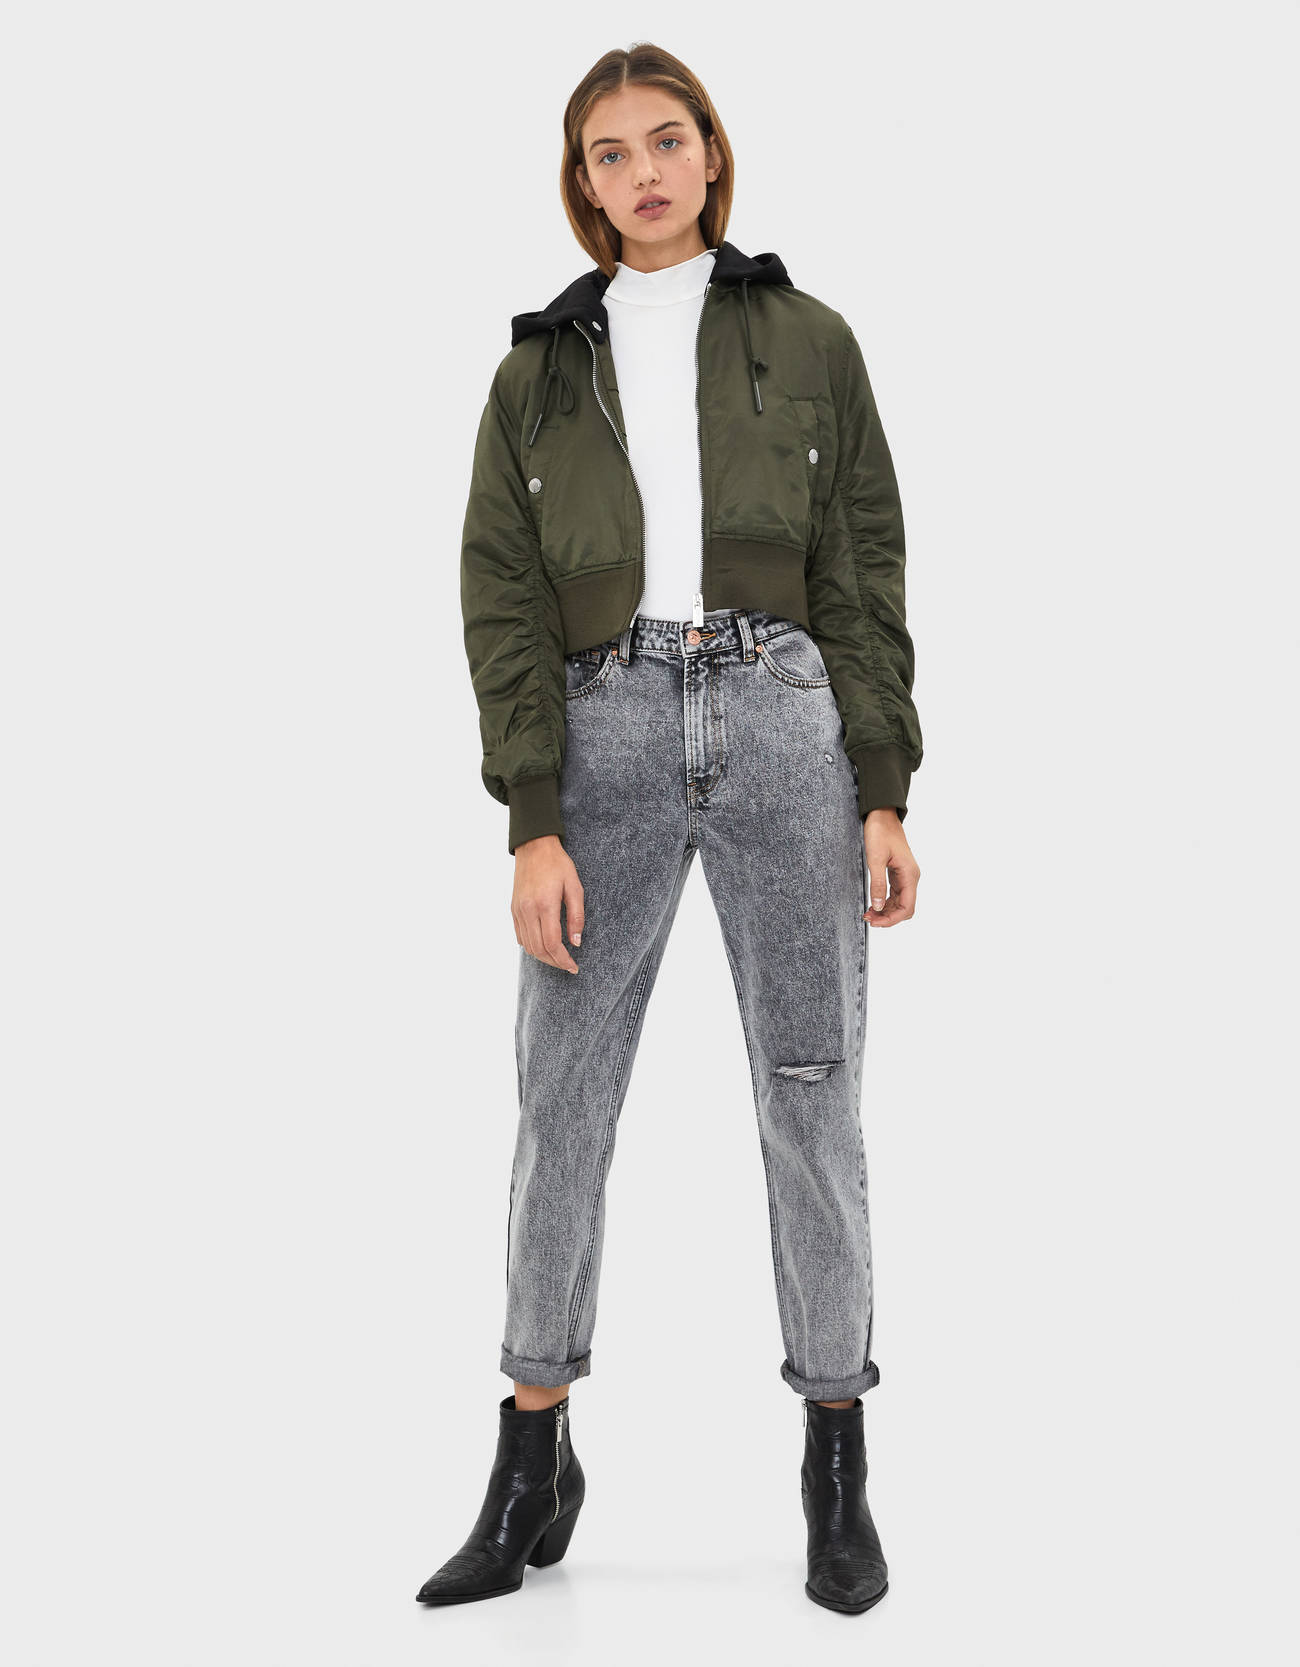 Куртка-бомбер с капюшоном ХАКИ Bershka